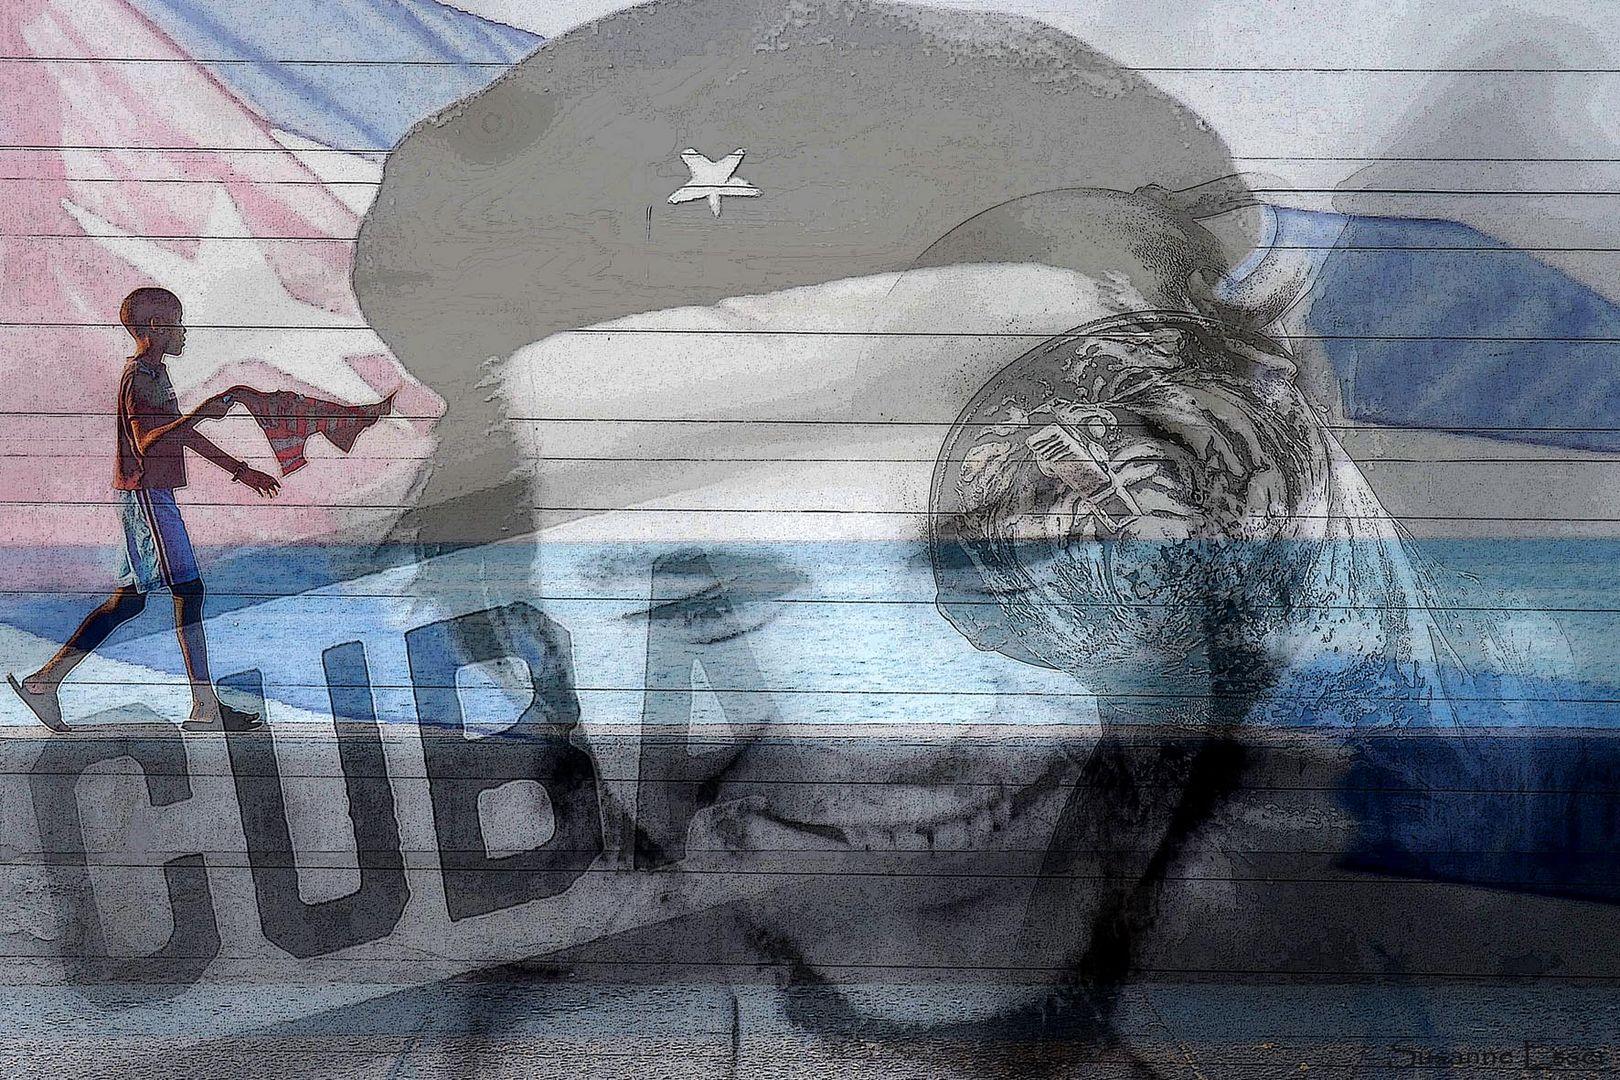 Cuba Real - 29